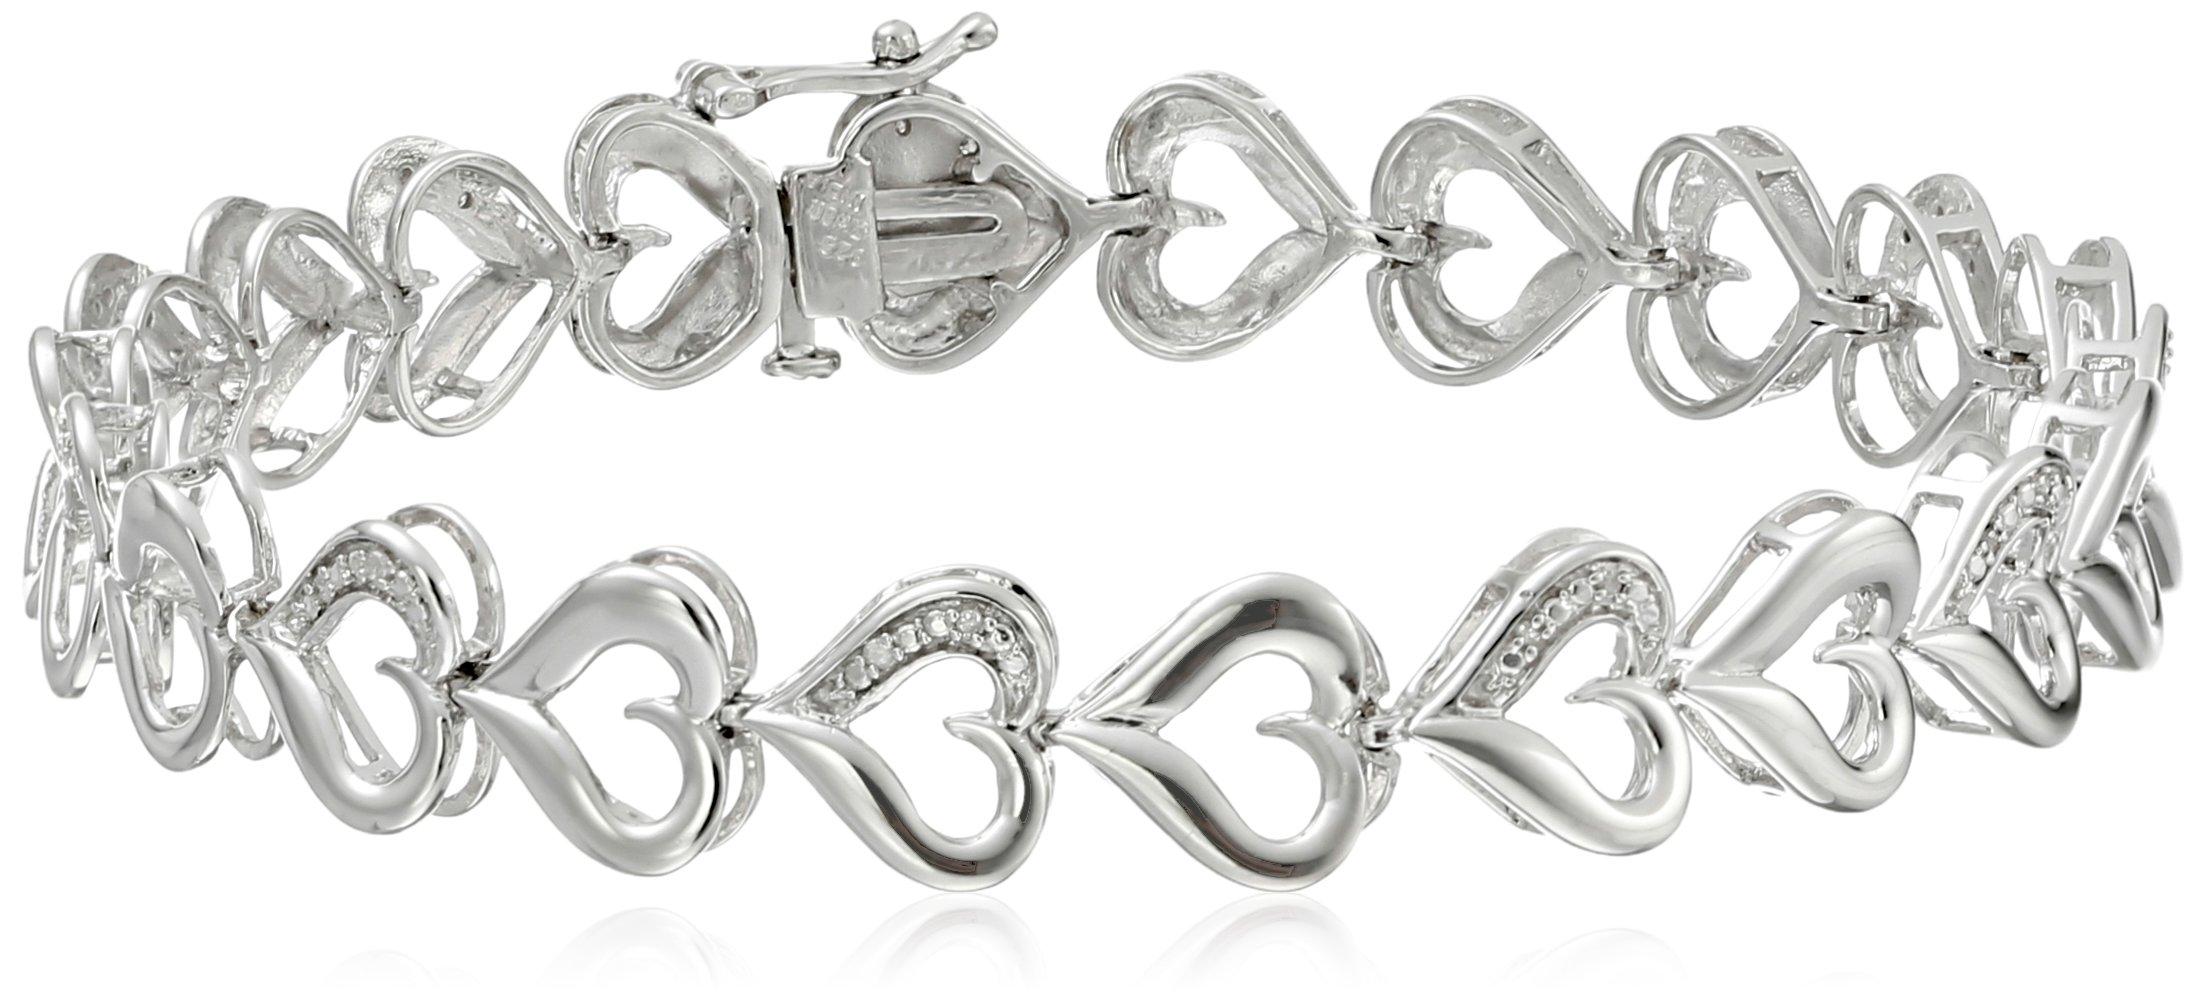 Sterling Silver Diamond Accent Heart Bracelet, 7.25 Inch